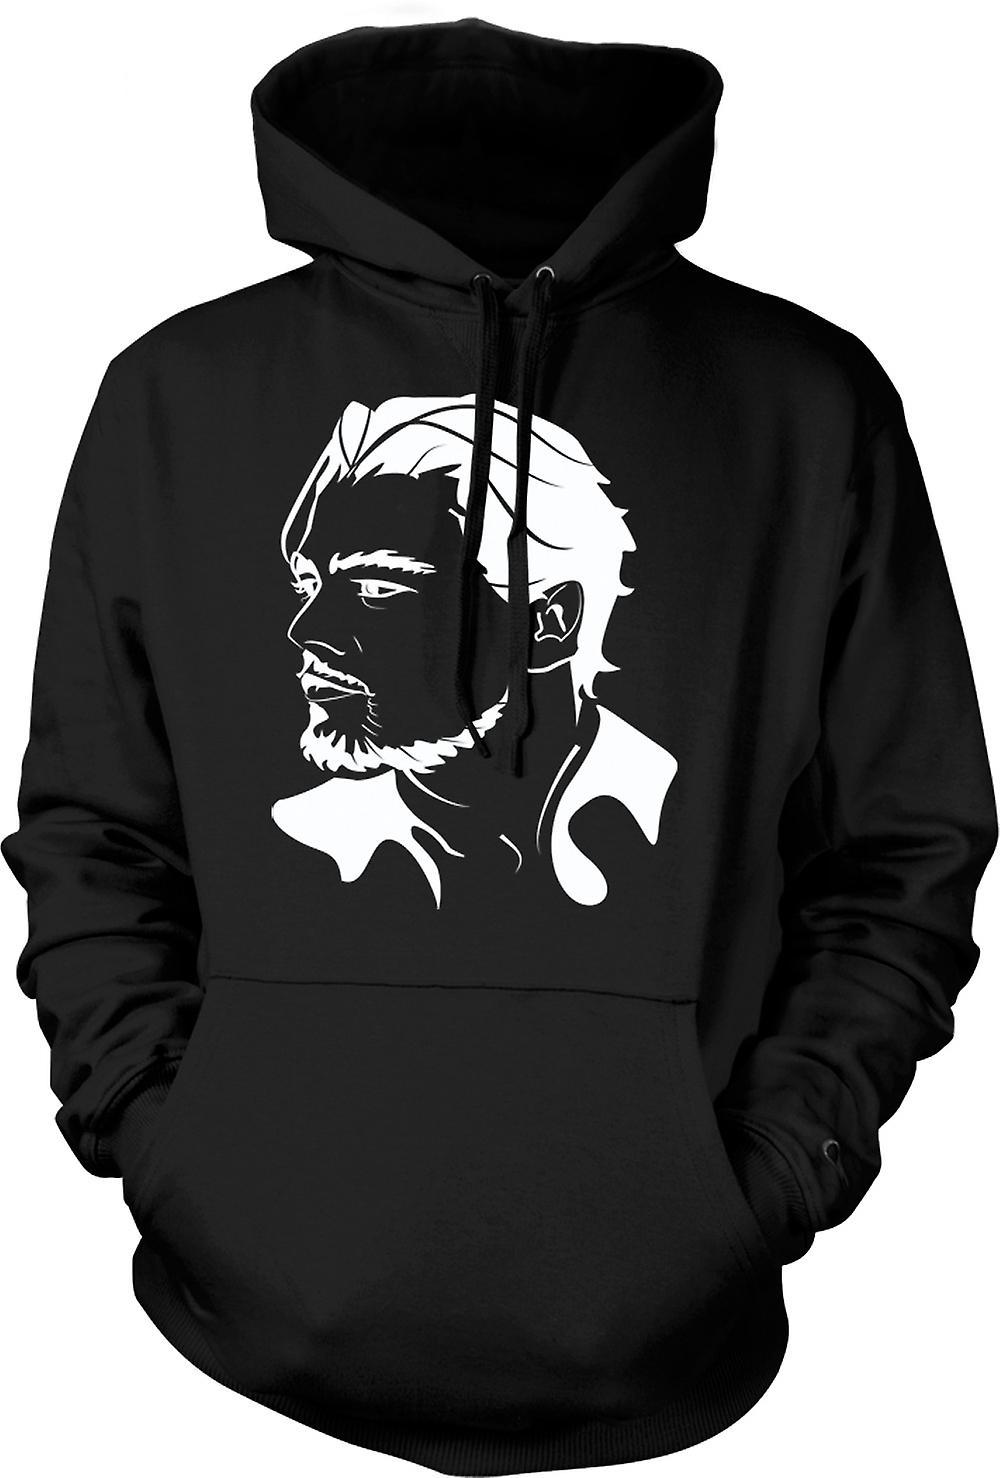 Mens Hoodie - Leonardo Dicaprio-Portrait